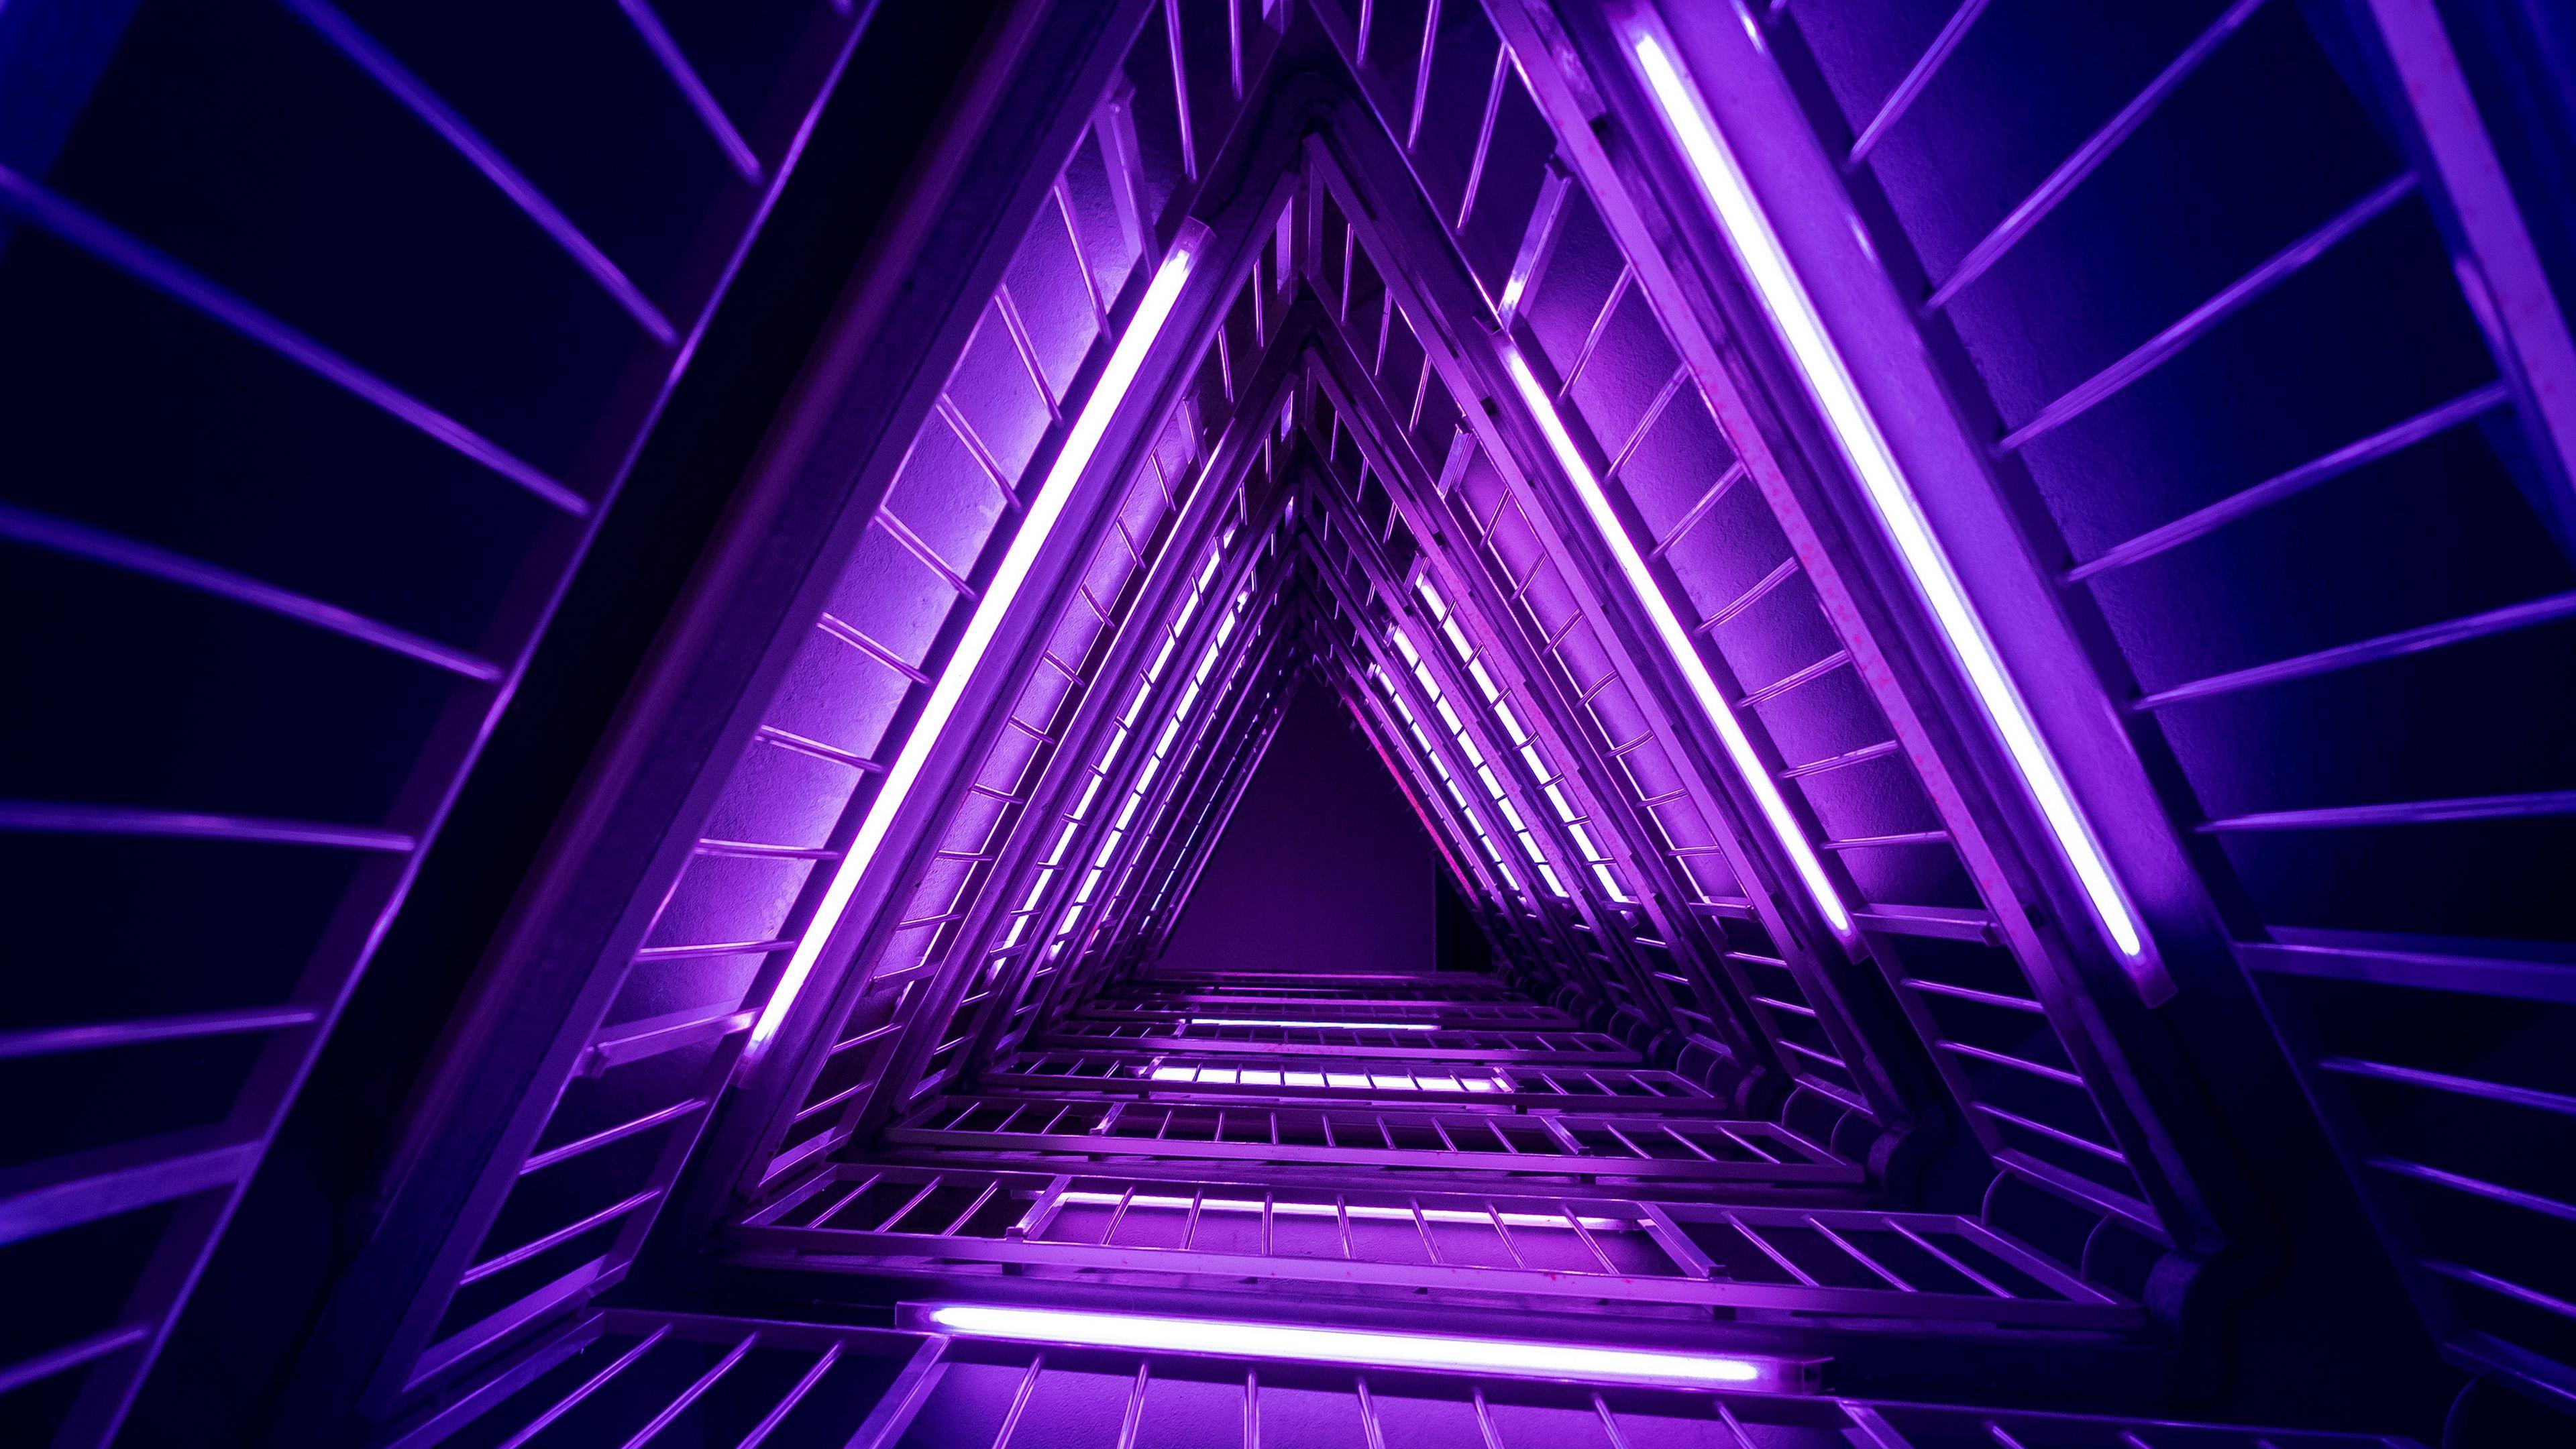 3840x2160 Wallpaper ladder, purple, light